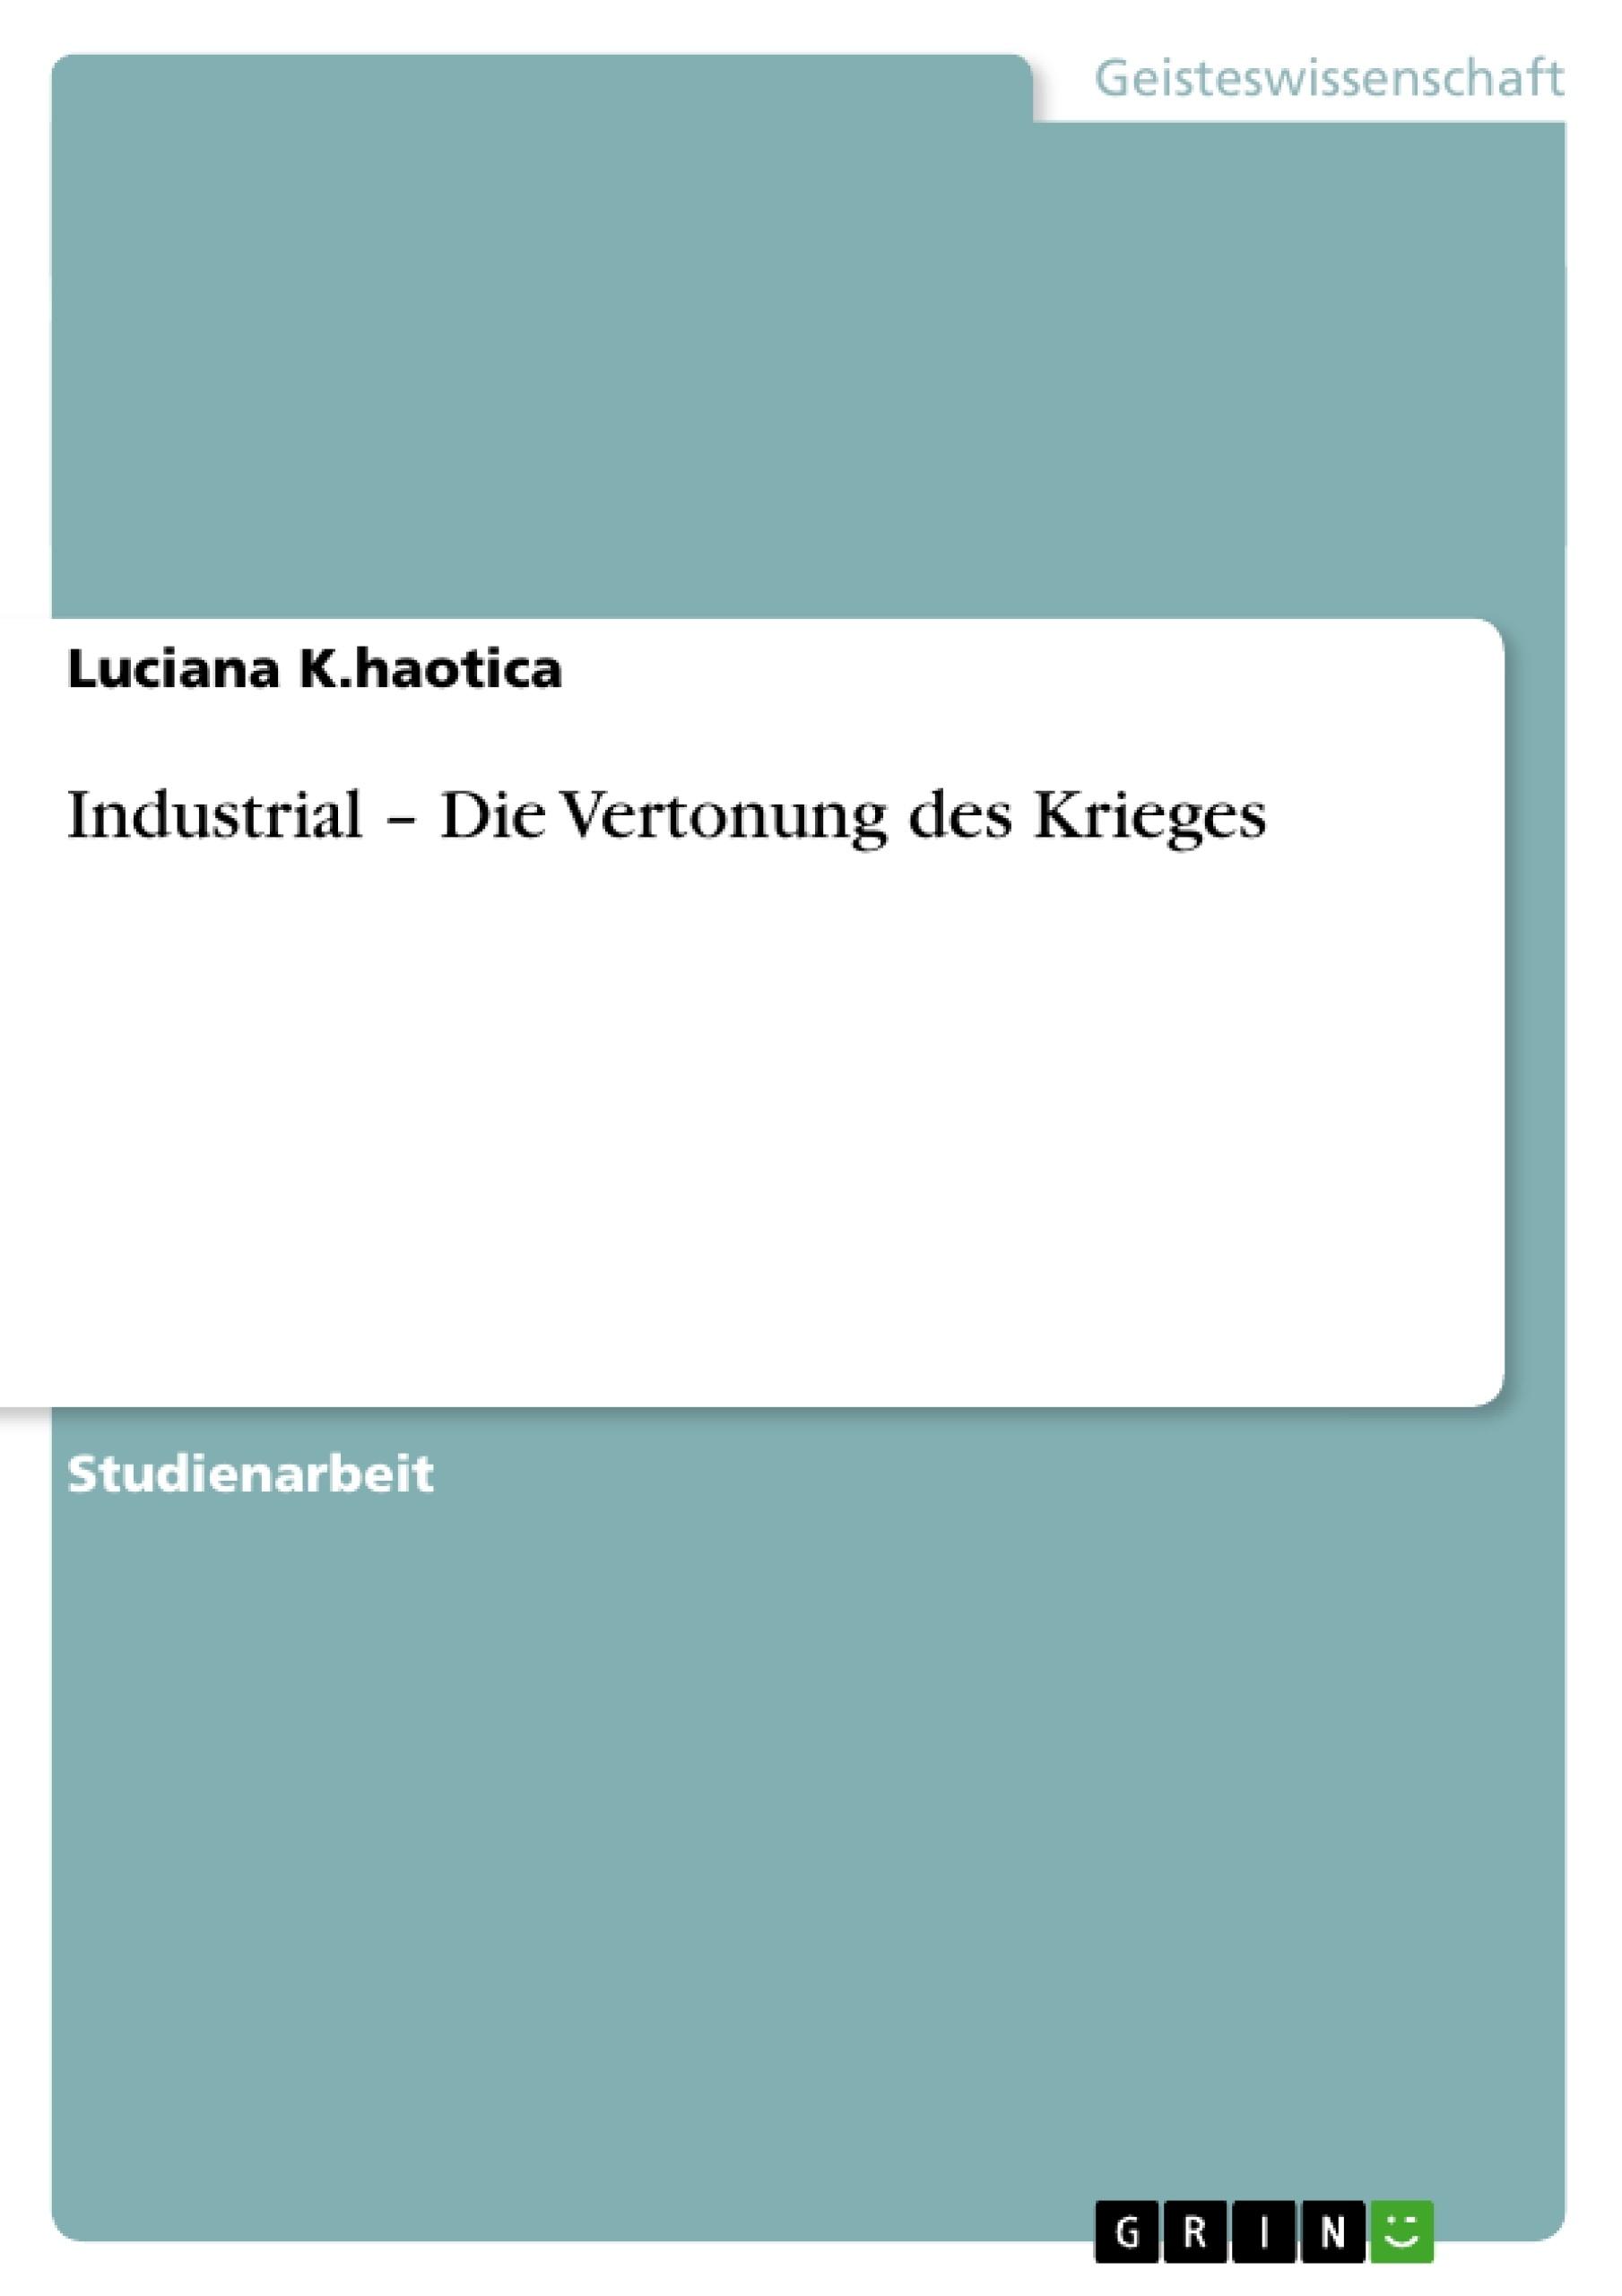 Titel: Industrial – Die Vertonung des Krieges